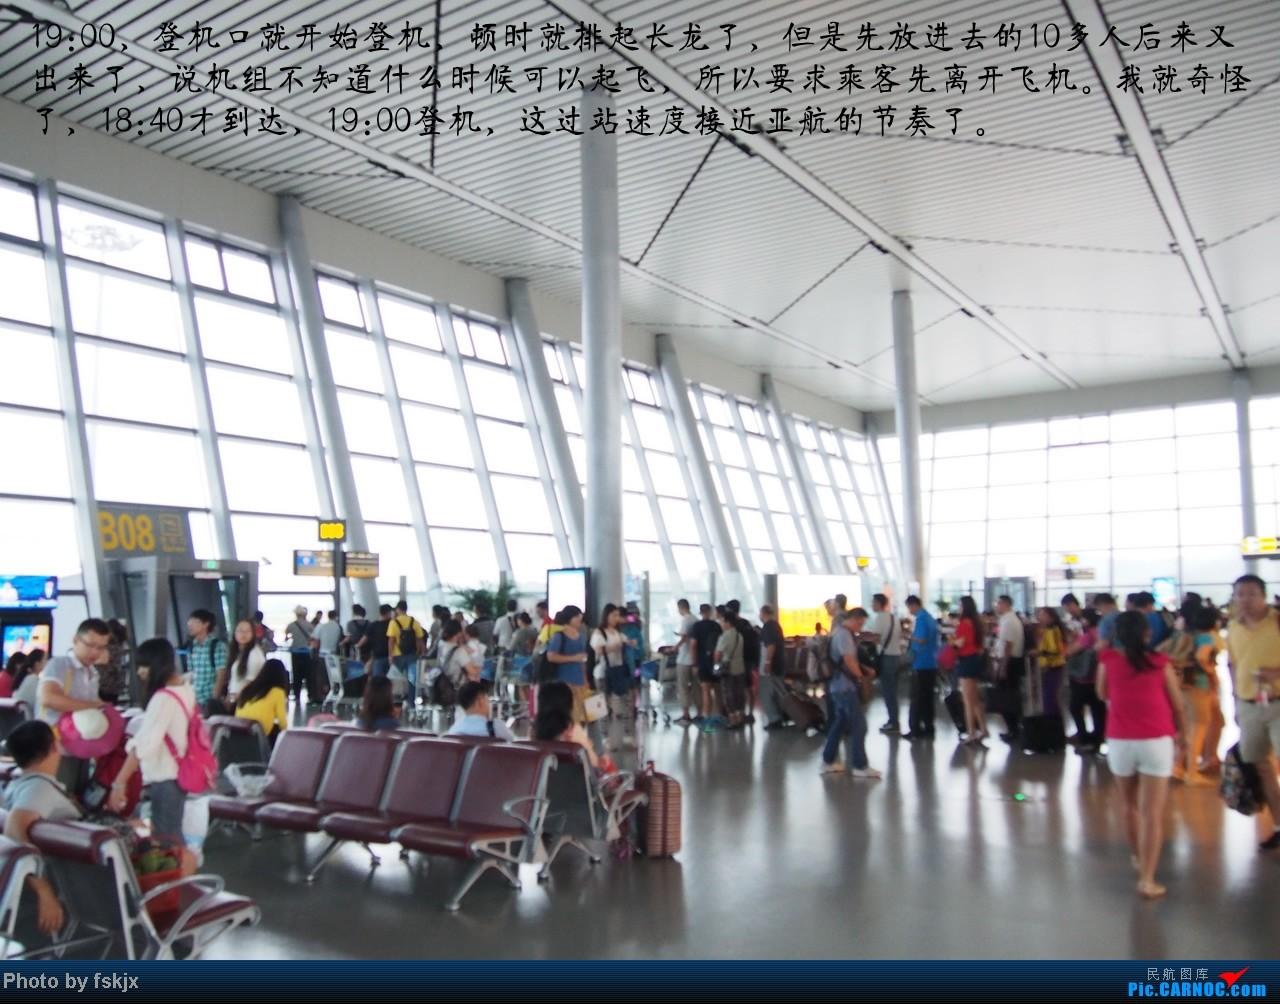 【fskjx的飞行游记☆9】盛夏贵州避暑,感受壮观的黄果树瀑布 BOEING 737-800 B-5697 中国贵阳龙洞堡机场 中国贵阳龙洞堡机场